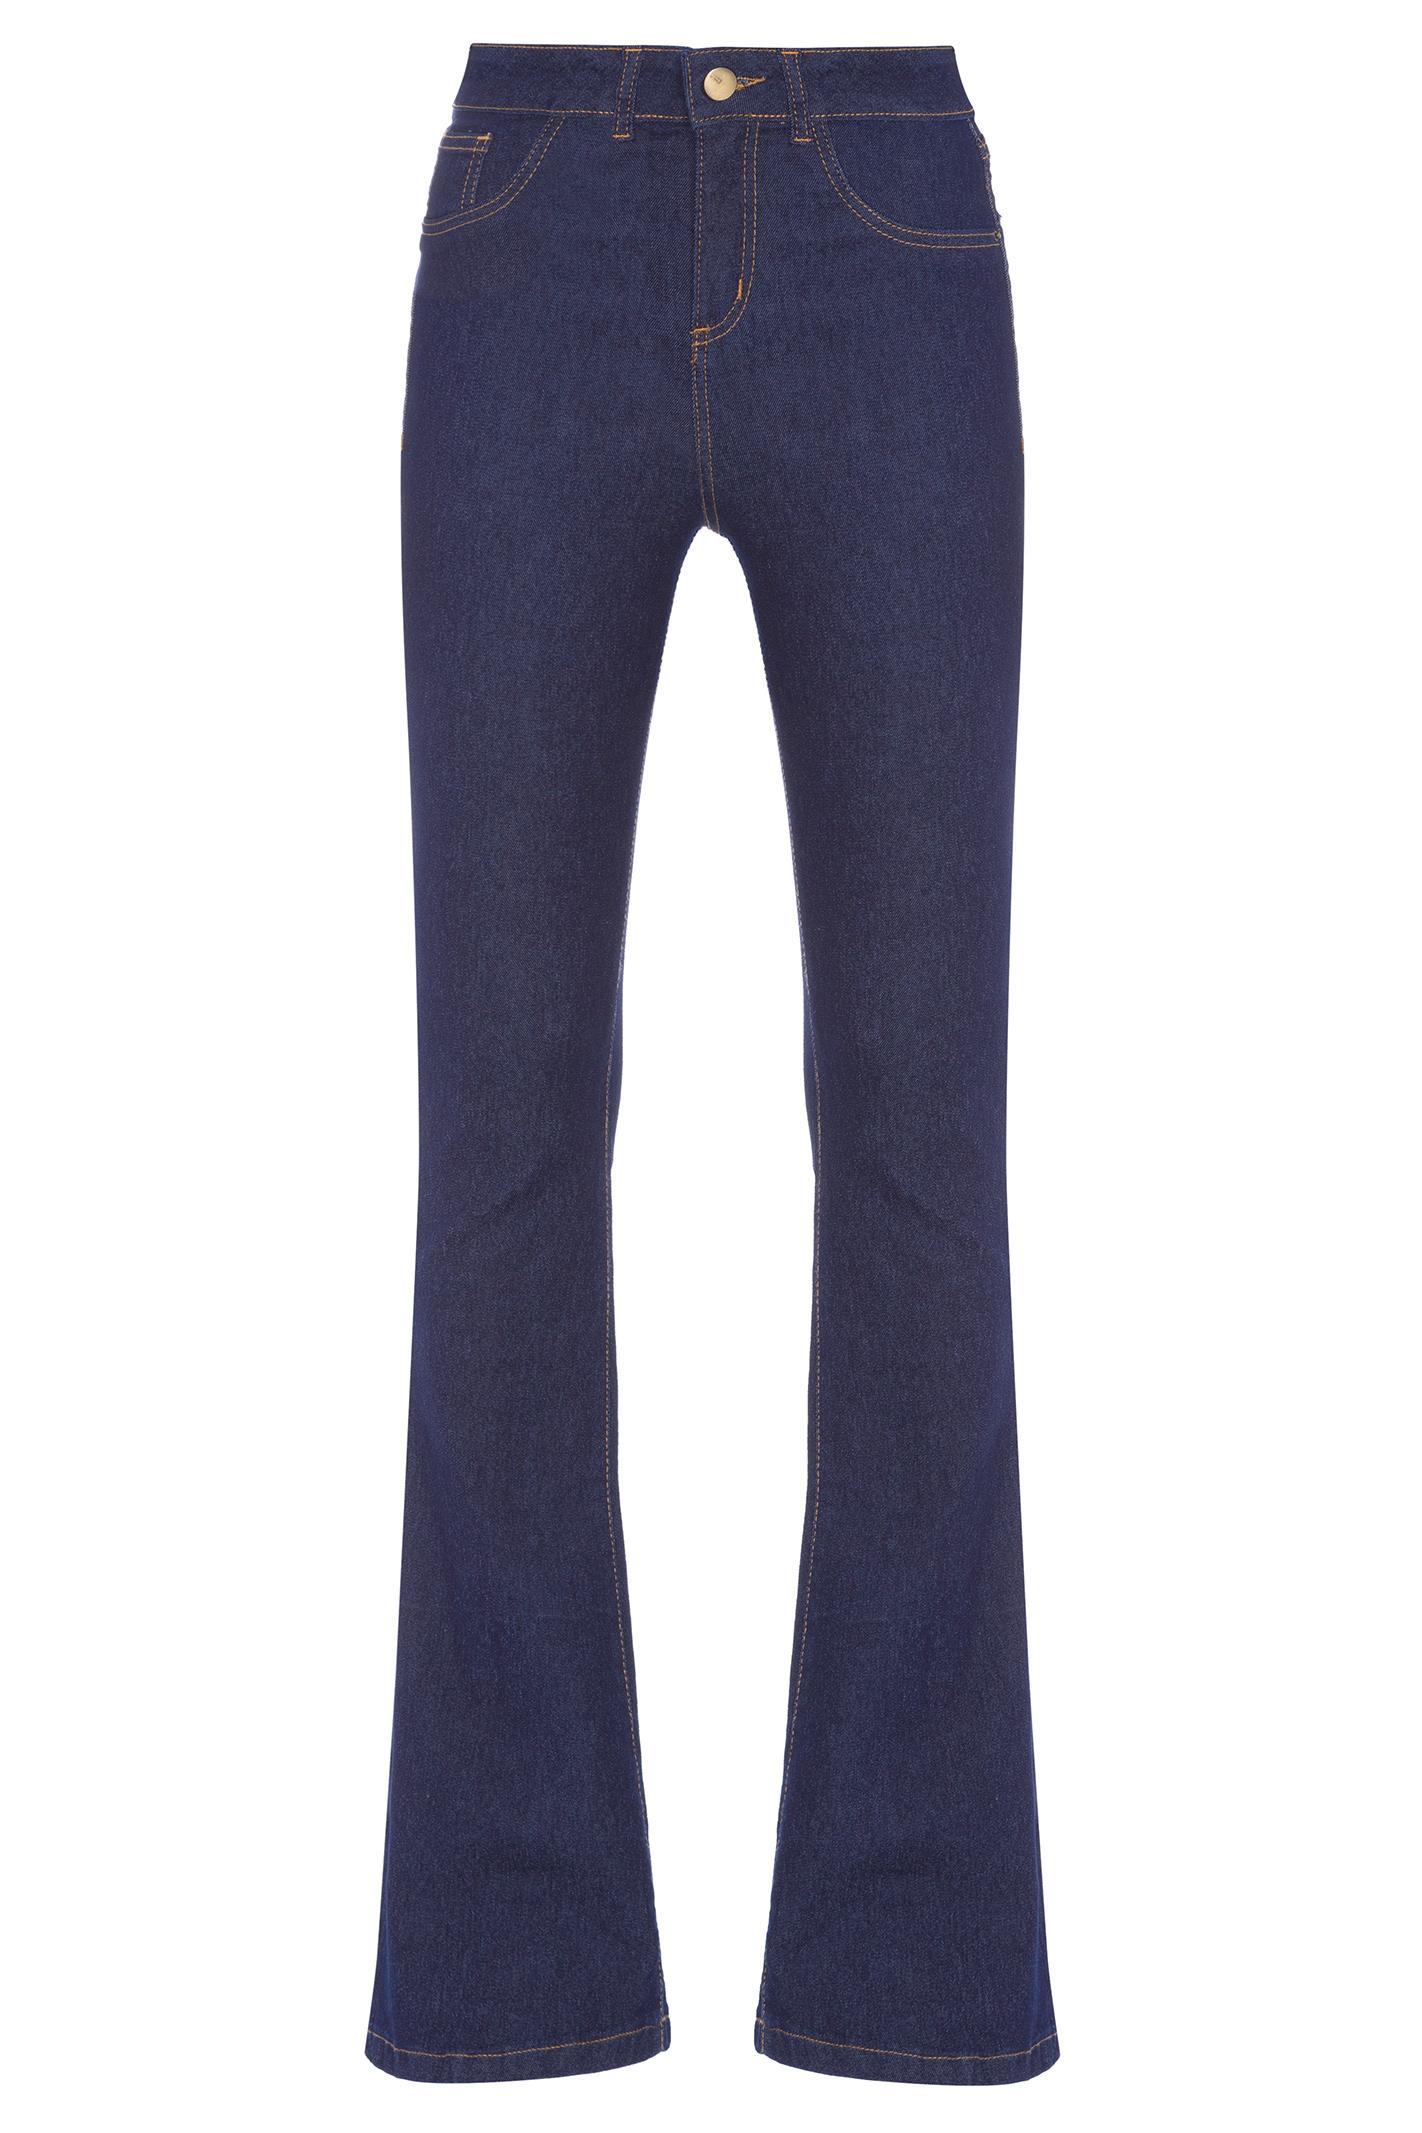 Calça Flare Jeans Elastano